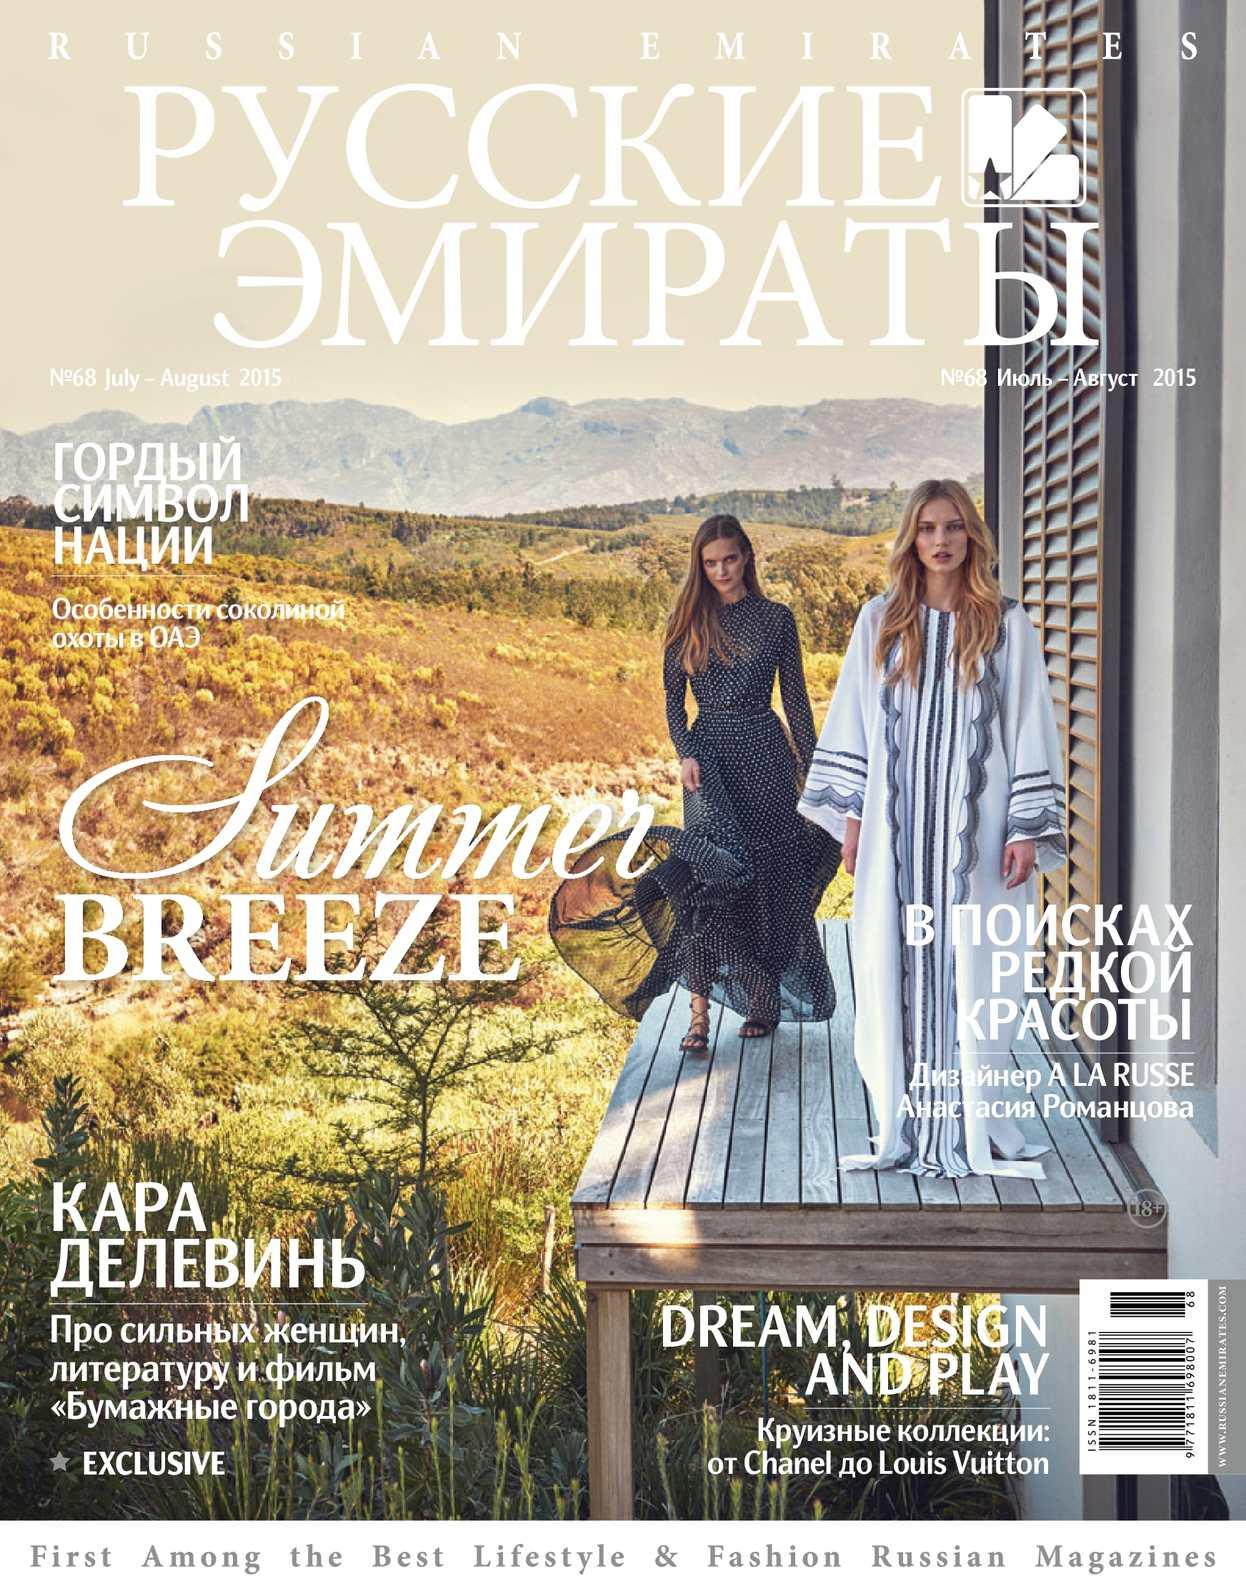 Calaméo - Russian Emirates Magazine     68   Jul - Aug 2015 4c9f73ee213